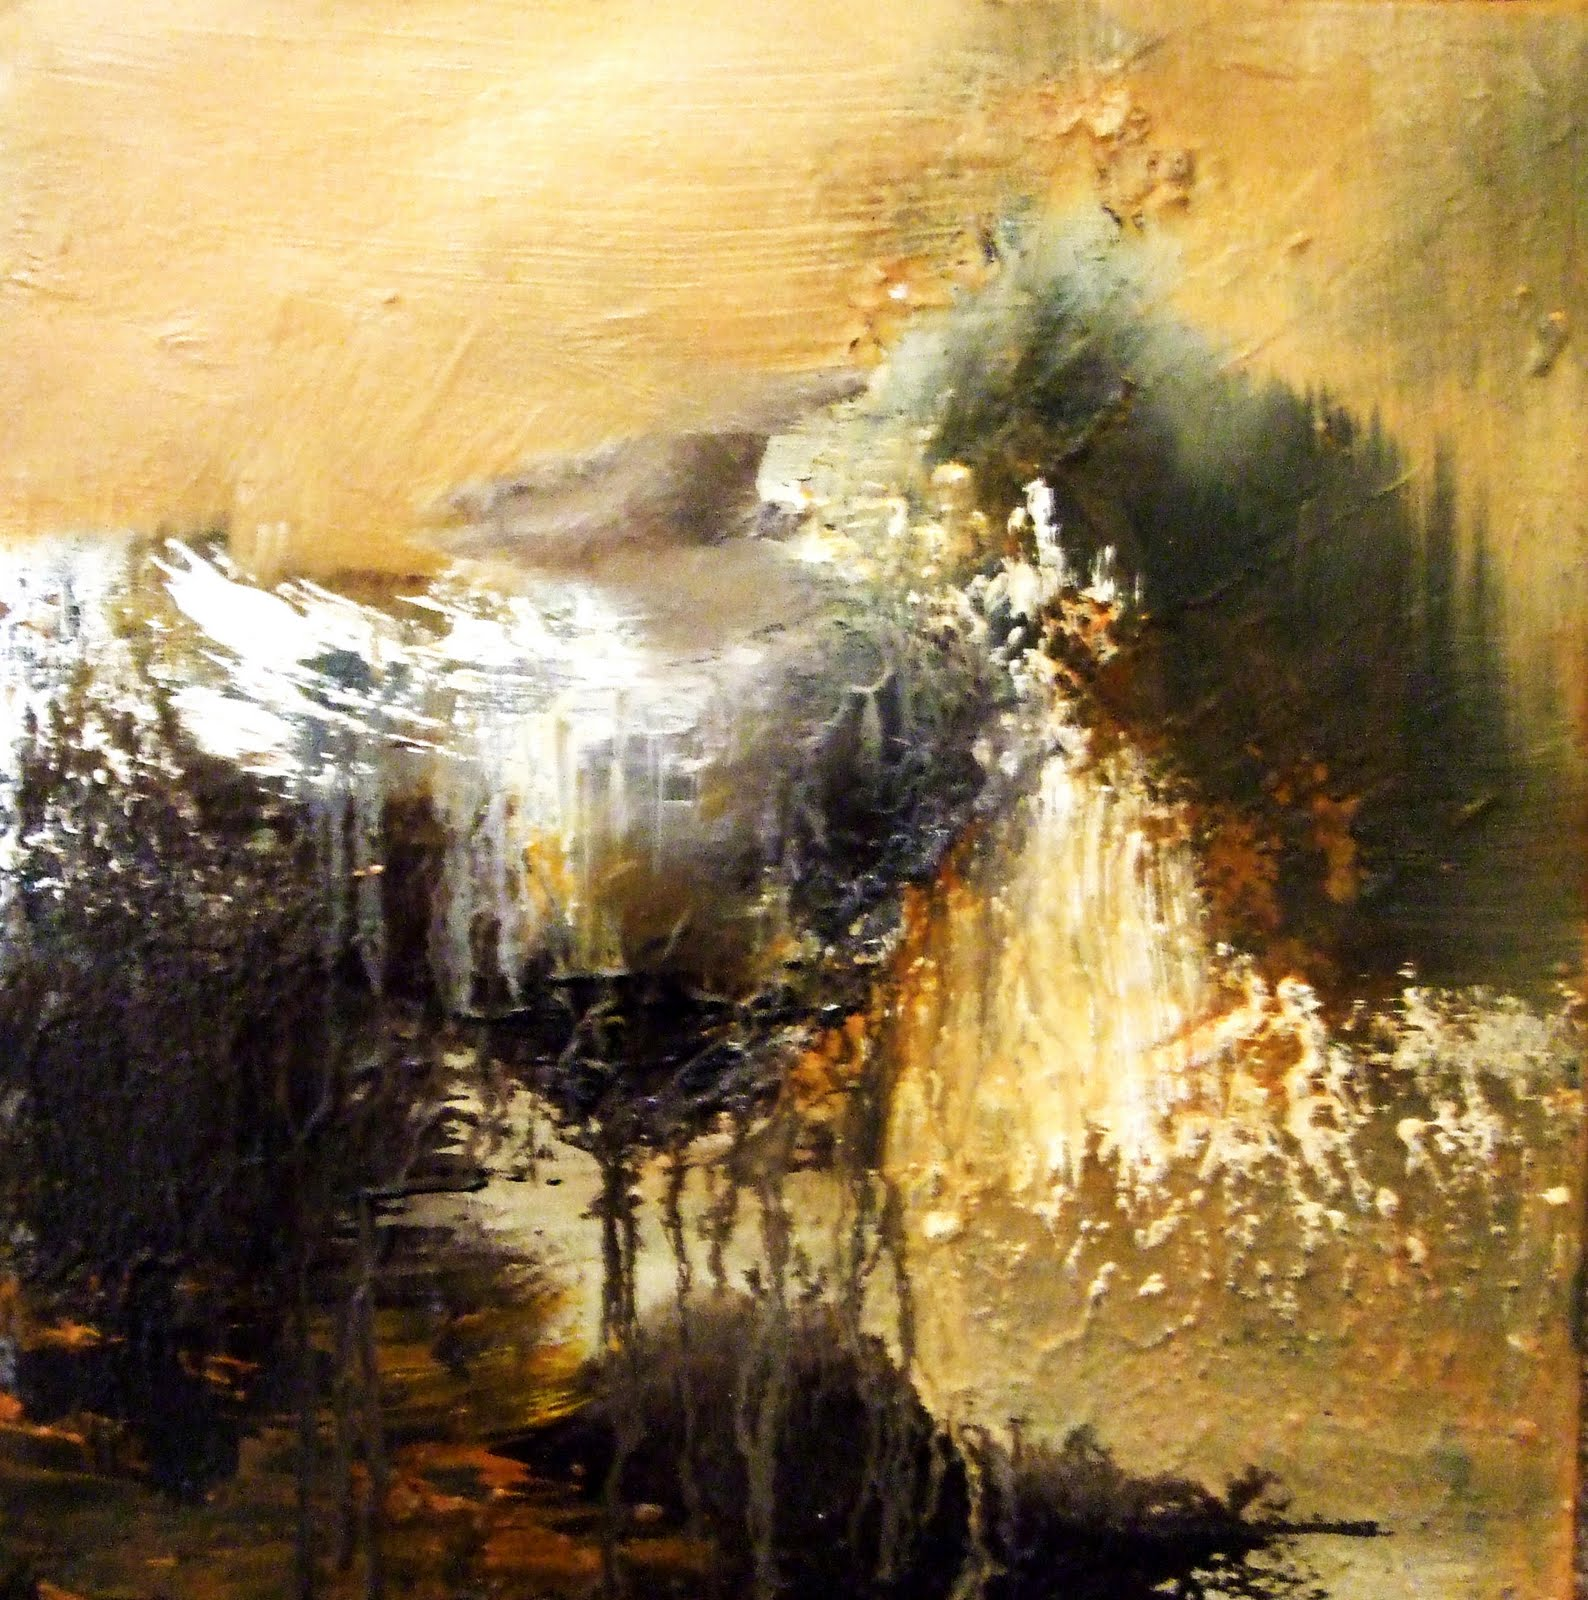 Cytise a b armi peintre abstrait for Peintres abstraits